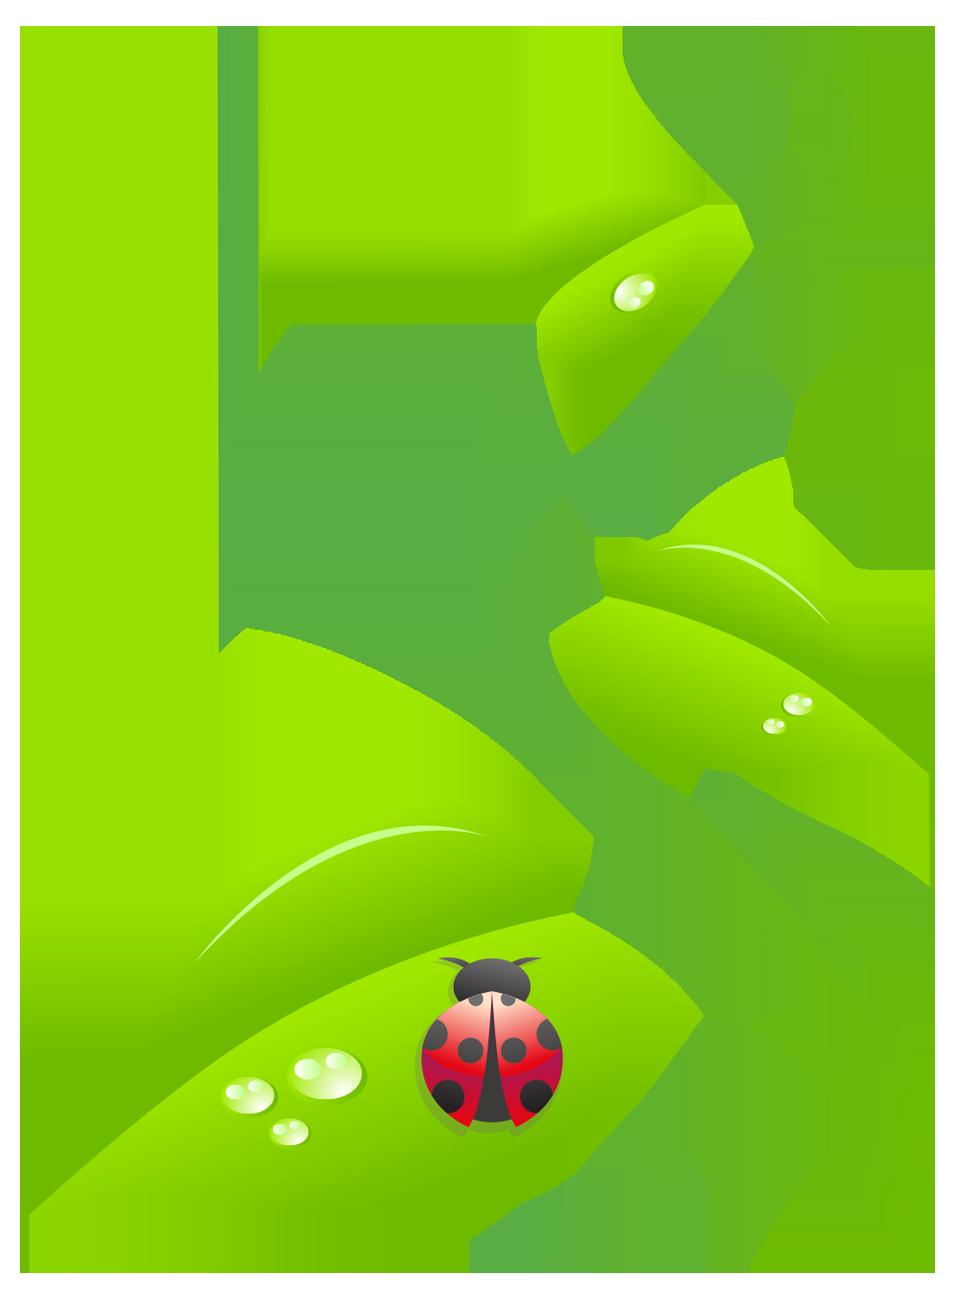 Ladybug_Vine